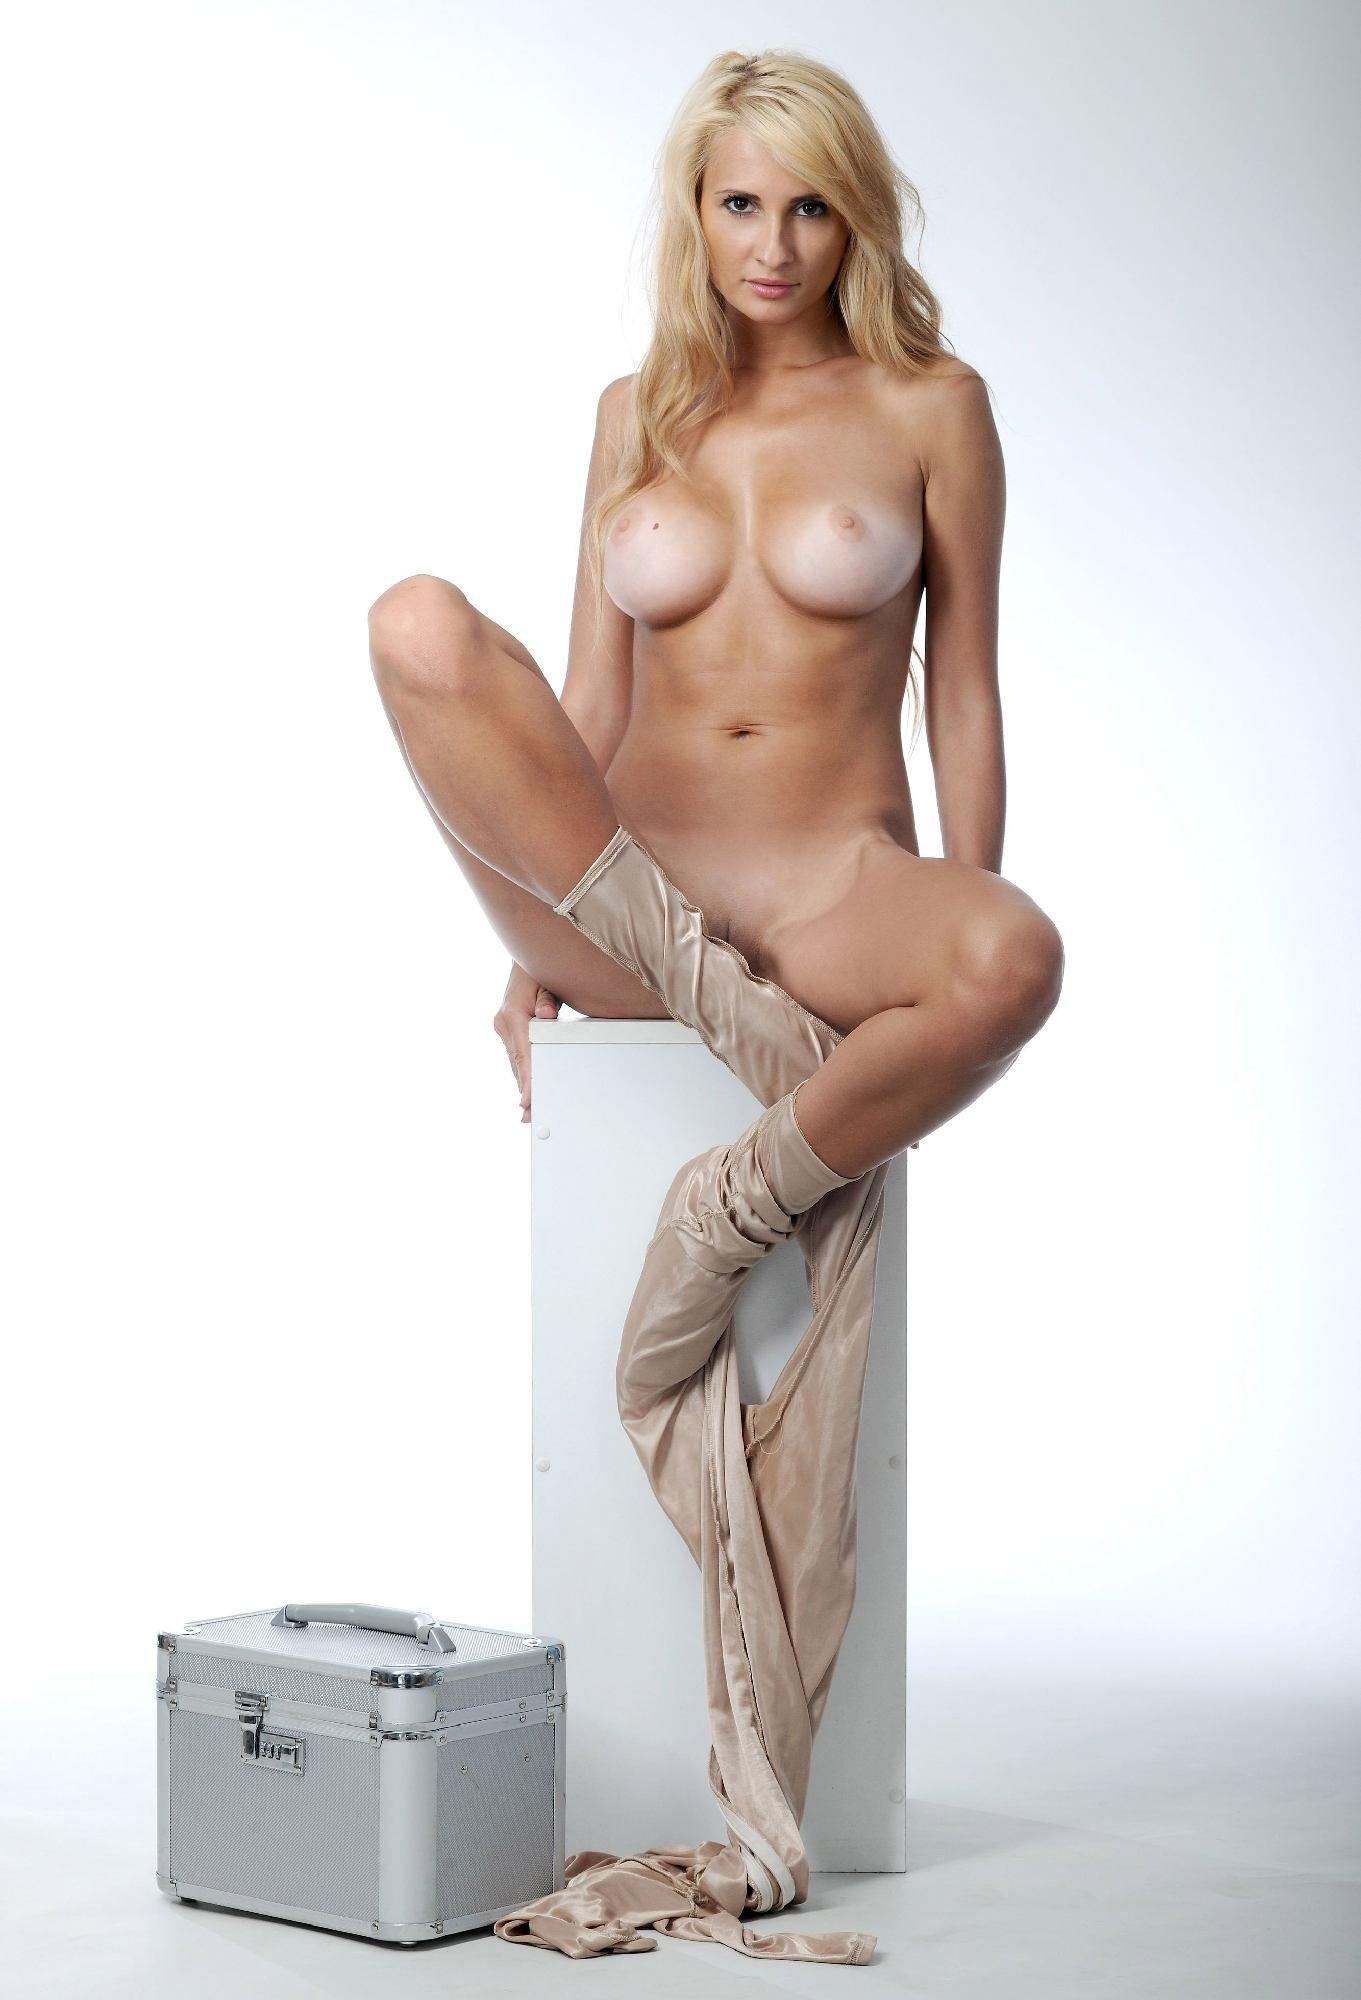 Ashley benson sexy naked